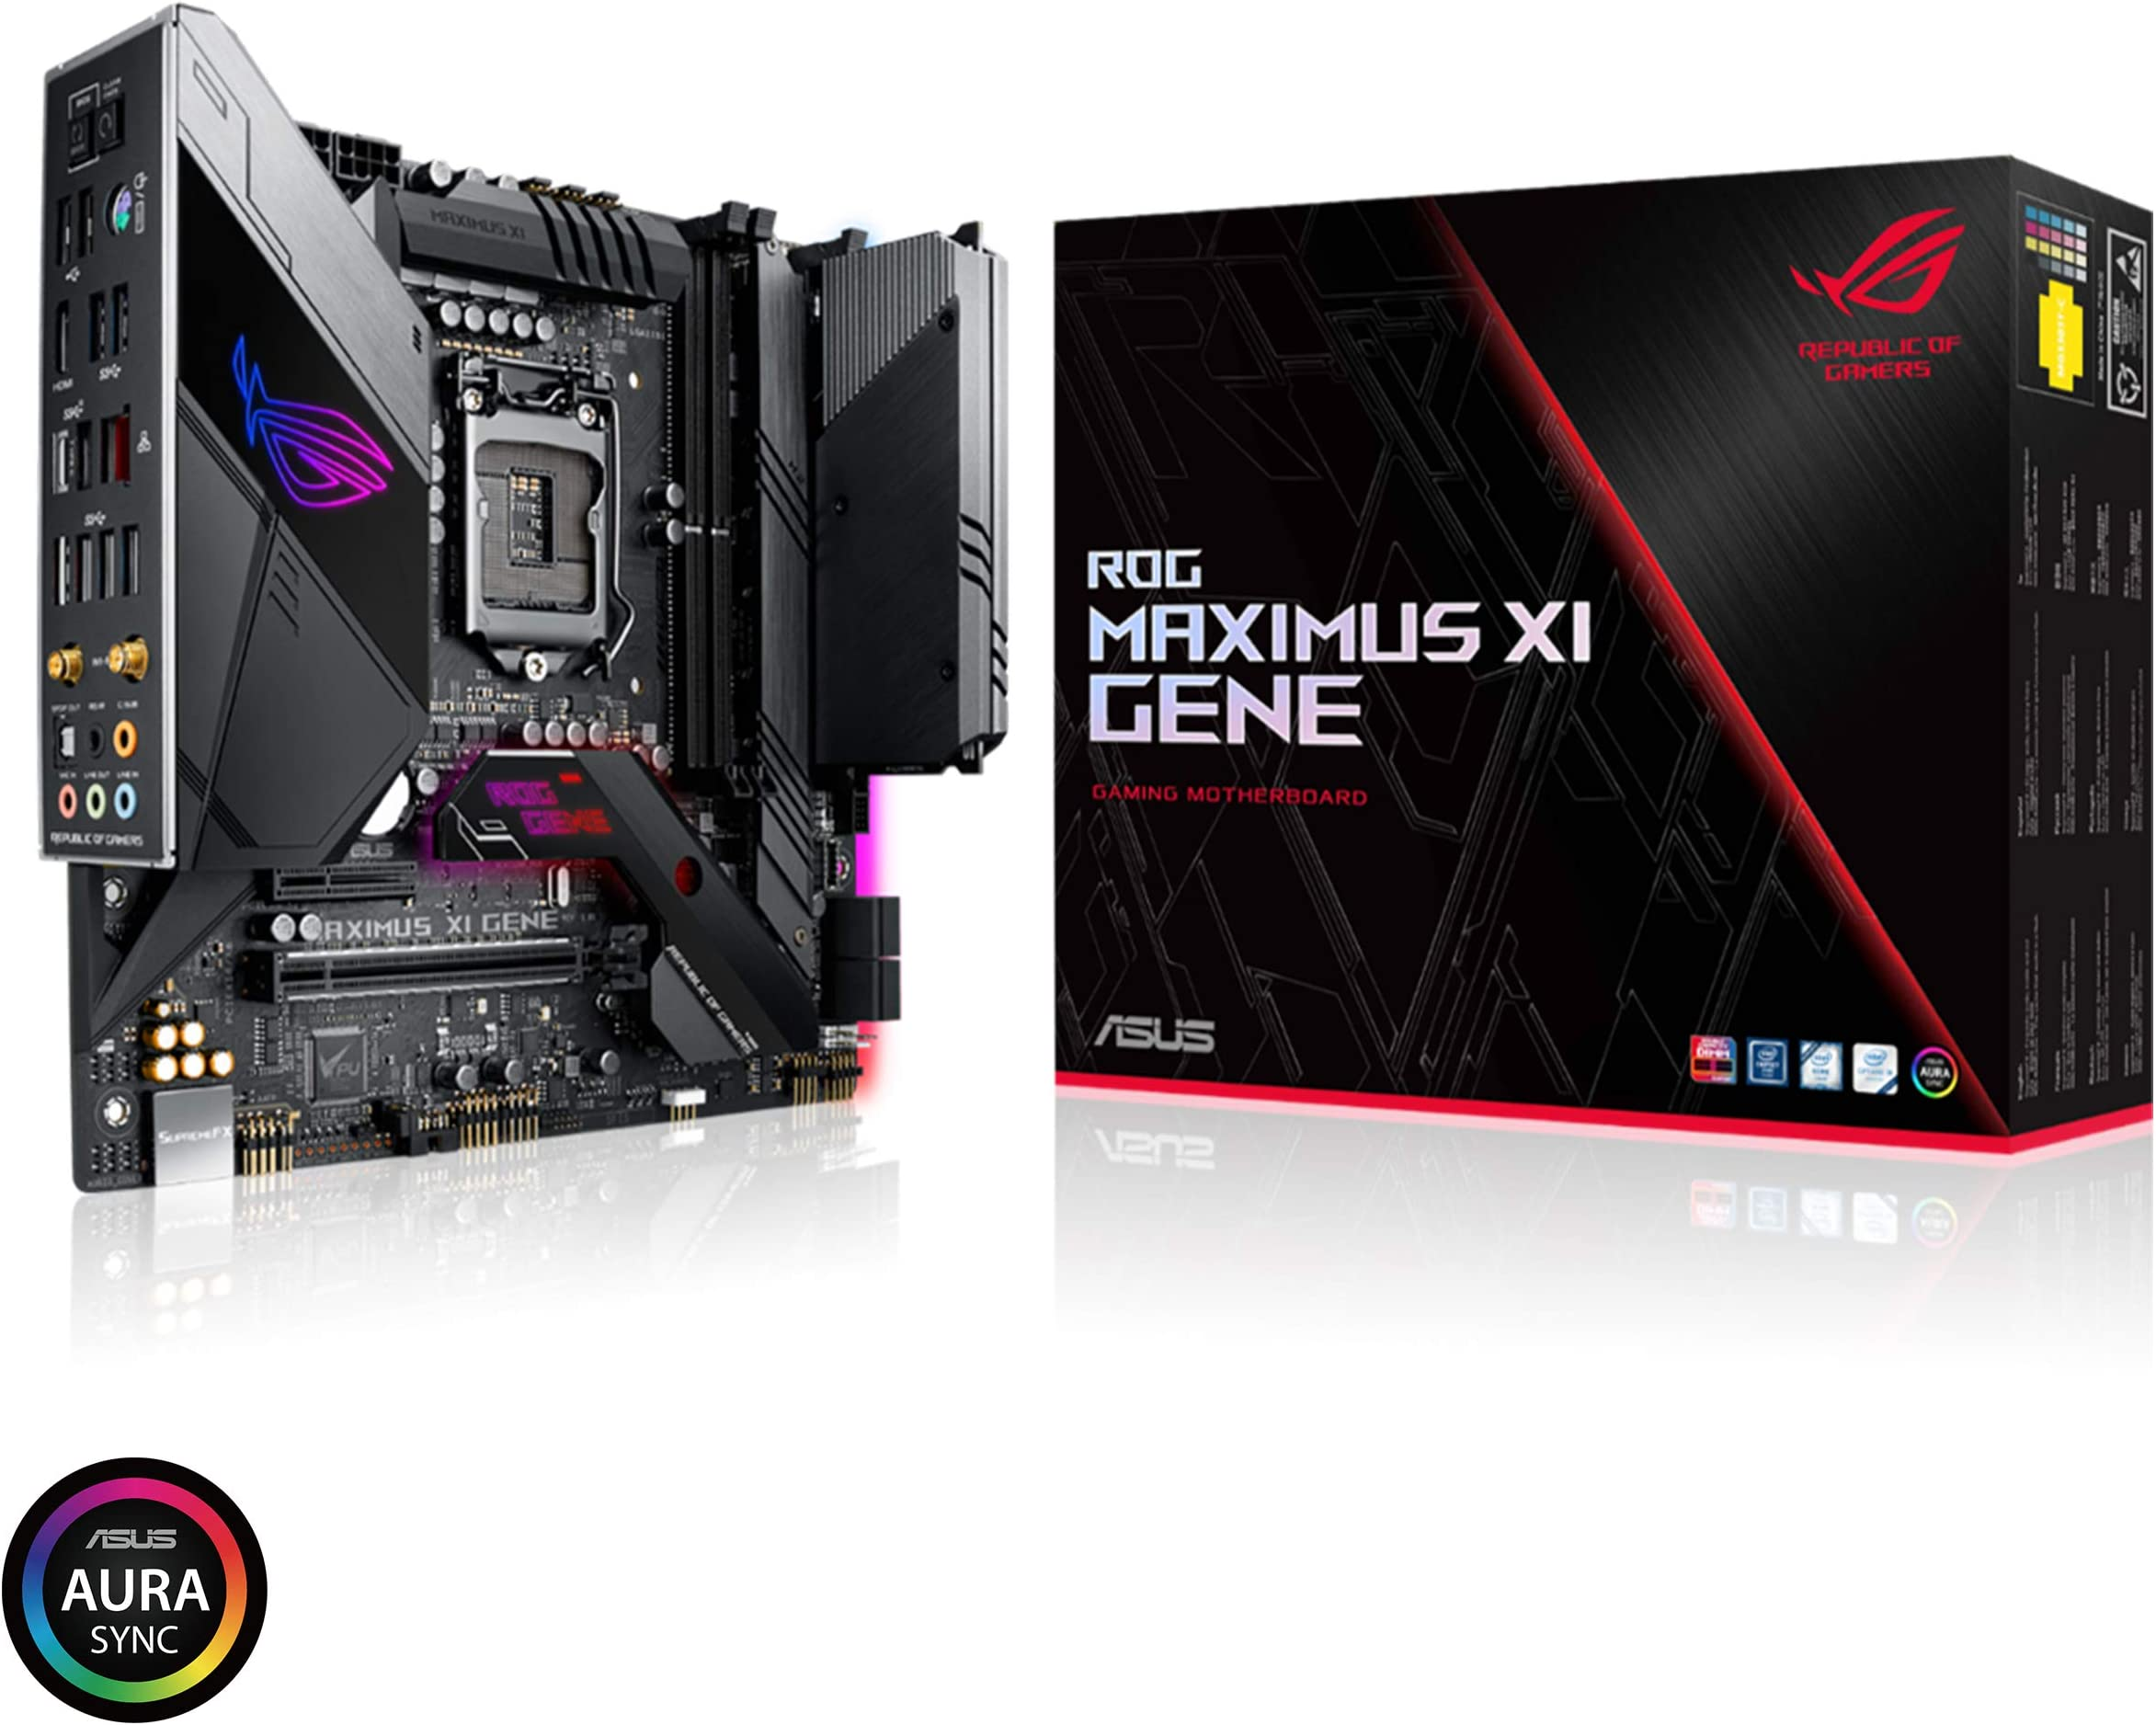 ASUS ROG Maximus XI Gene Z390